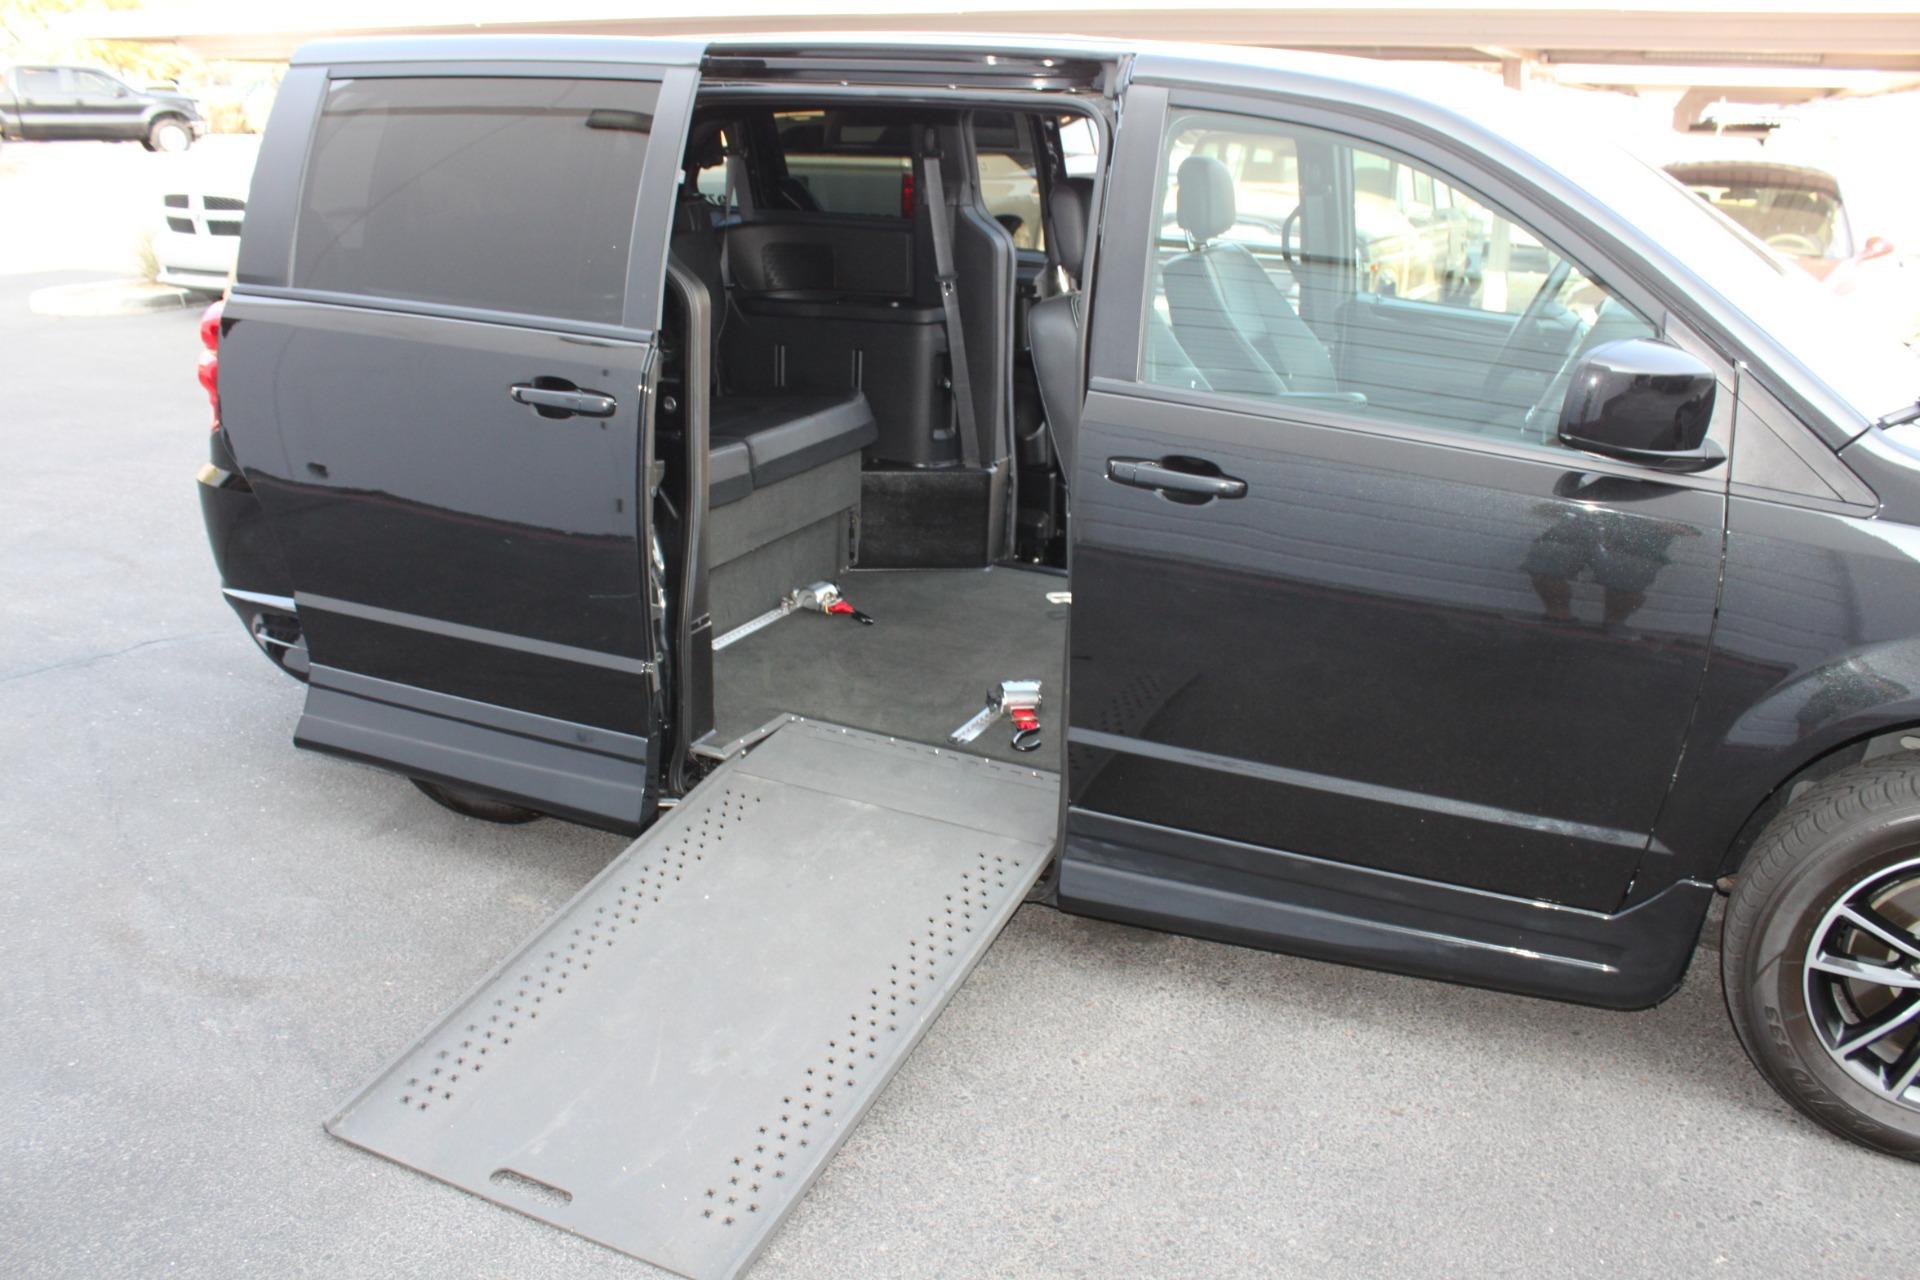 Used-2018-Dodge-Grand-Caravan-SXT-Rollx-Mobility-Conversion-Land-Cruiser